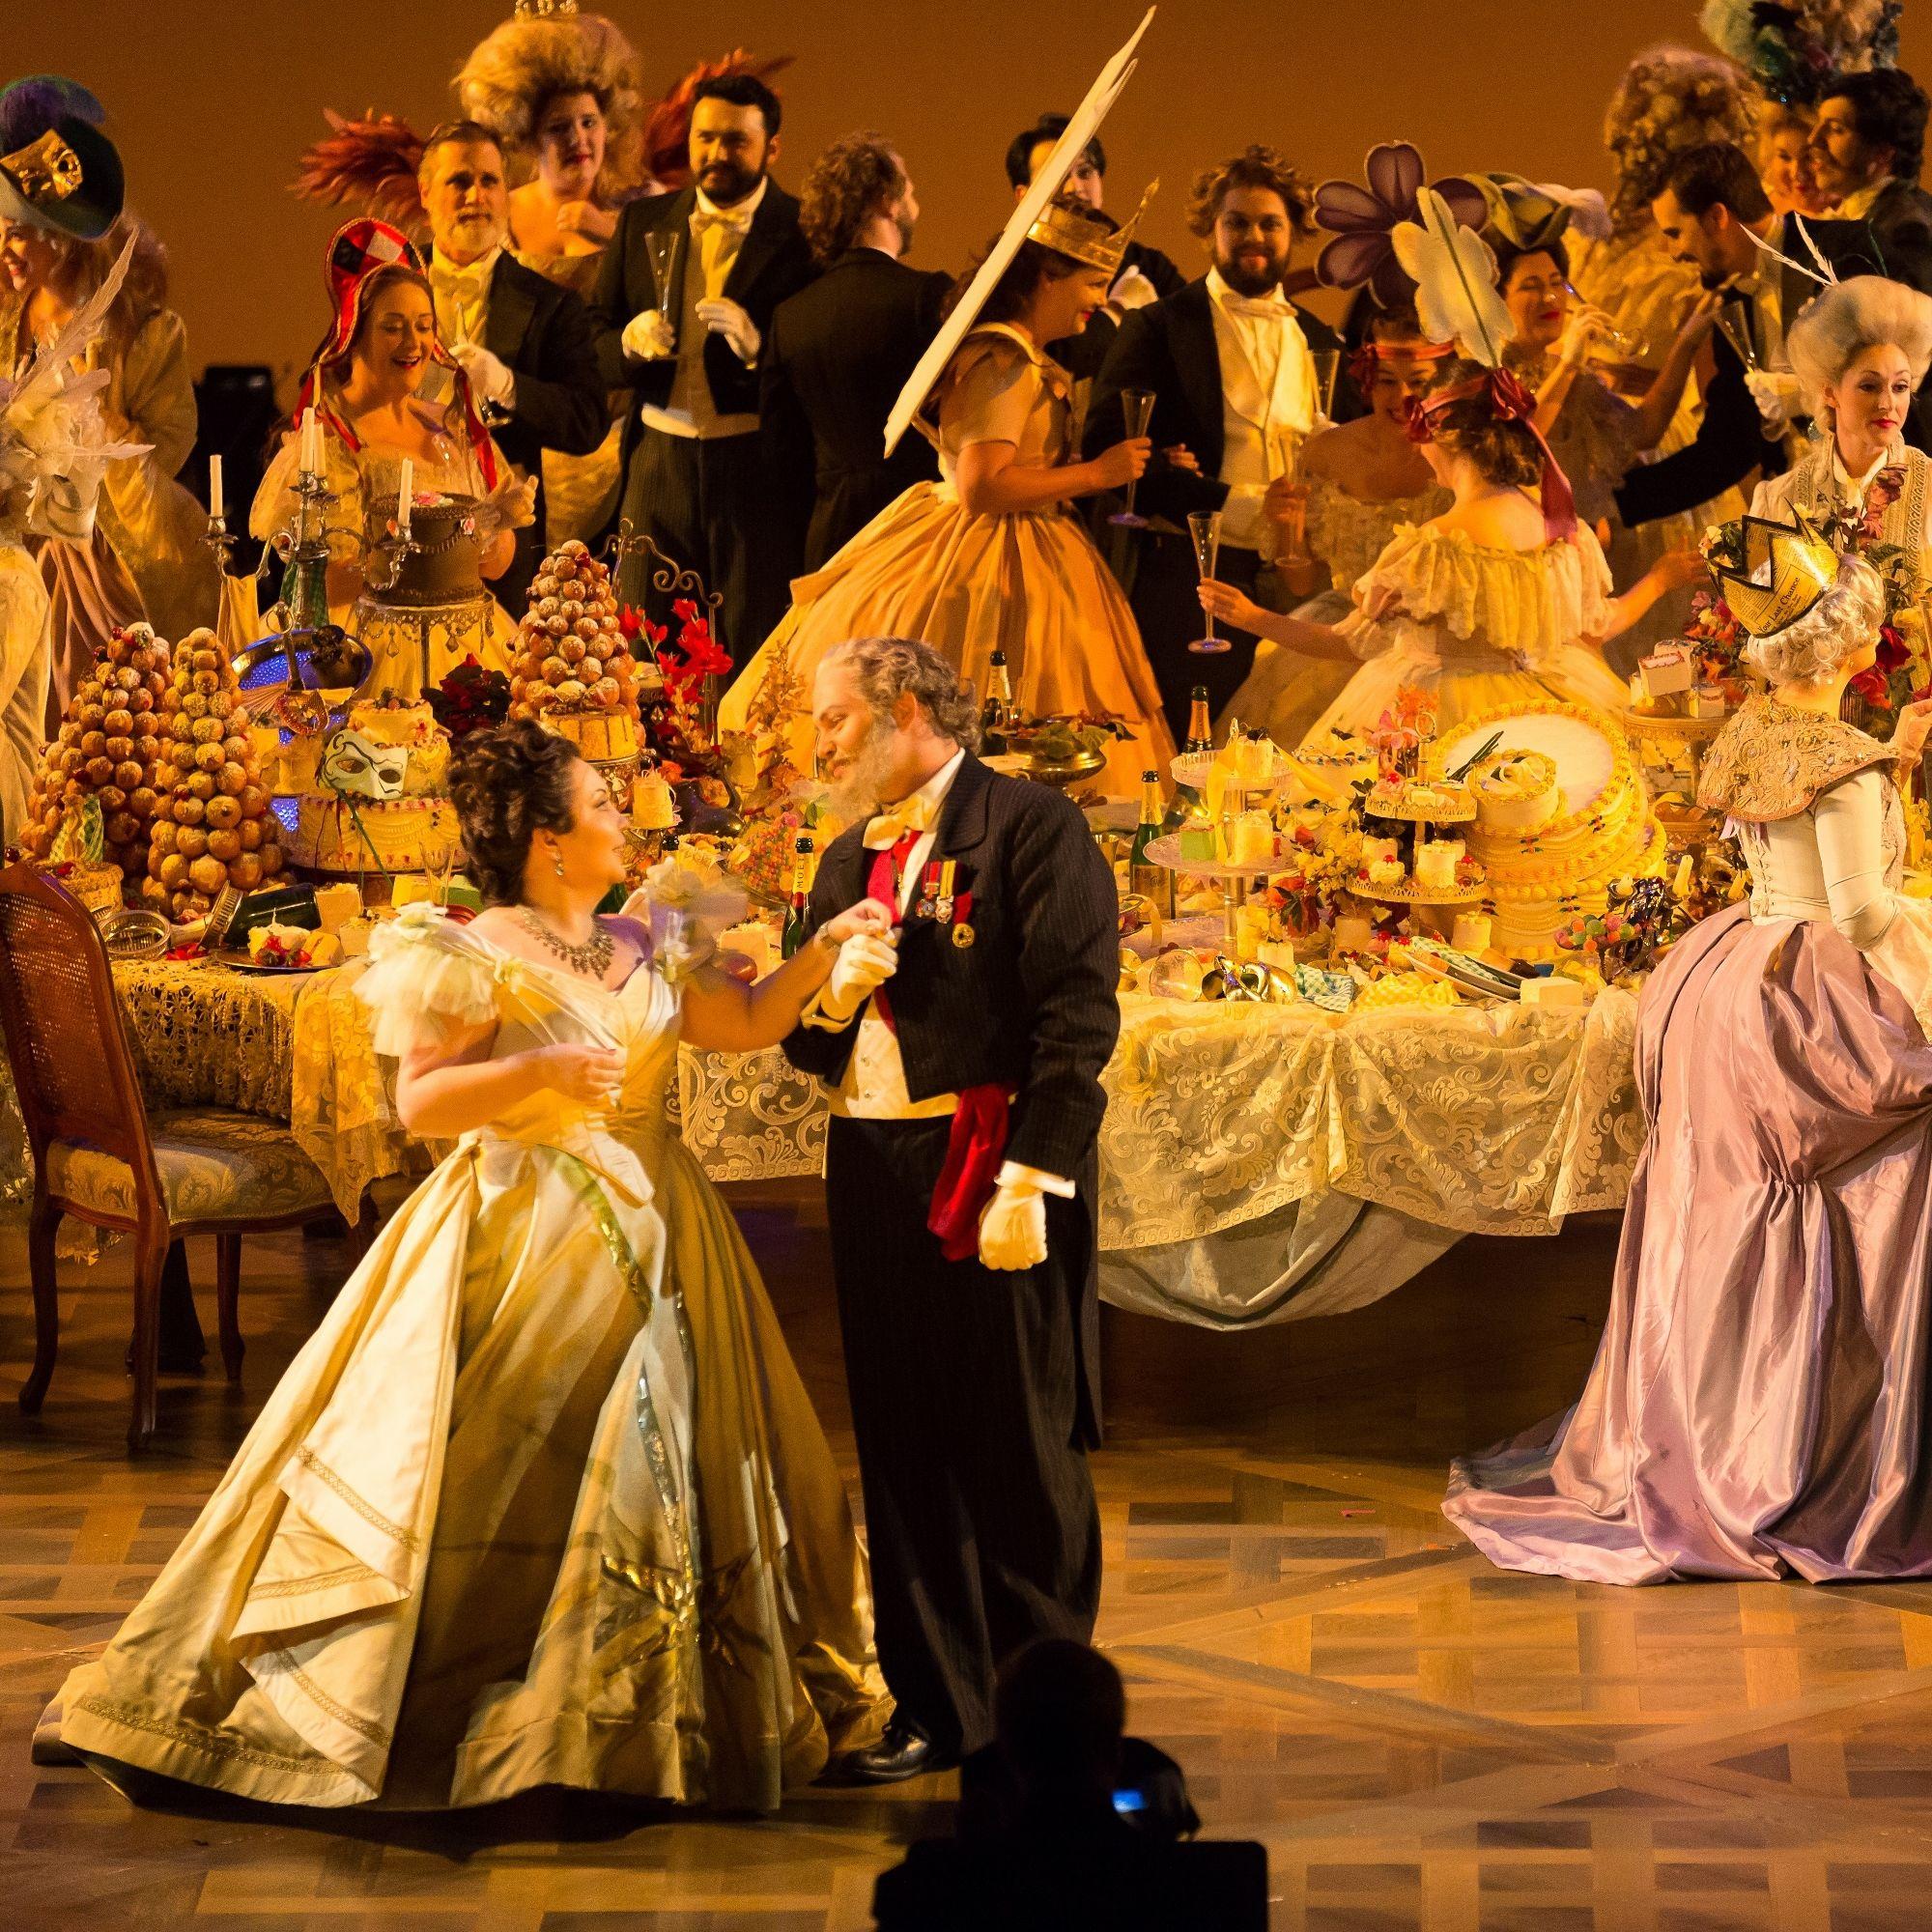 Hgo   la traviata   2017   photographer lynn lane 5 3000x2000 vxpurx